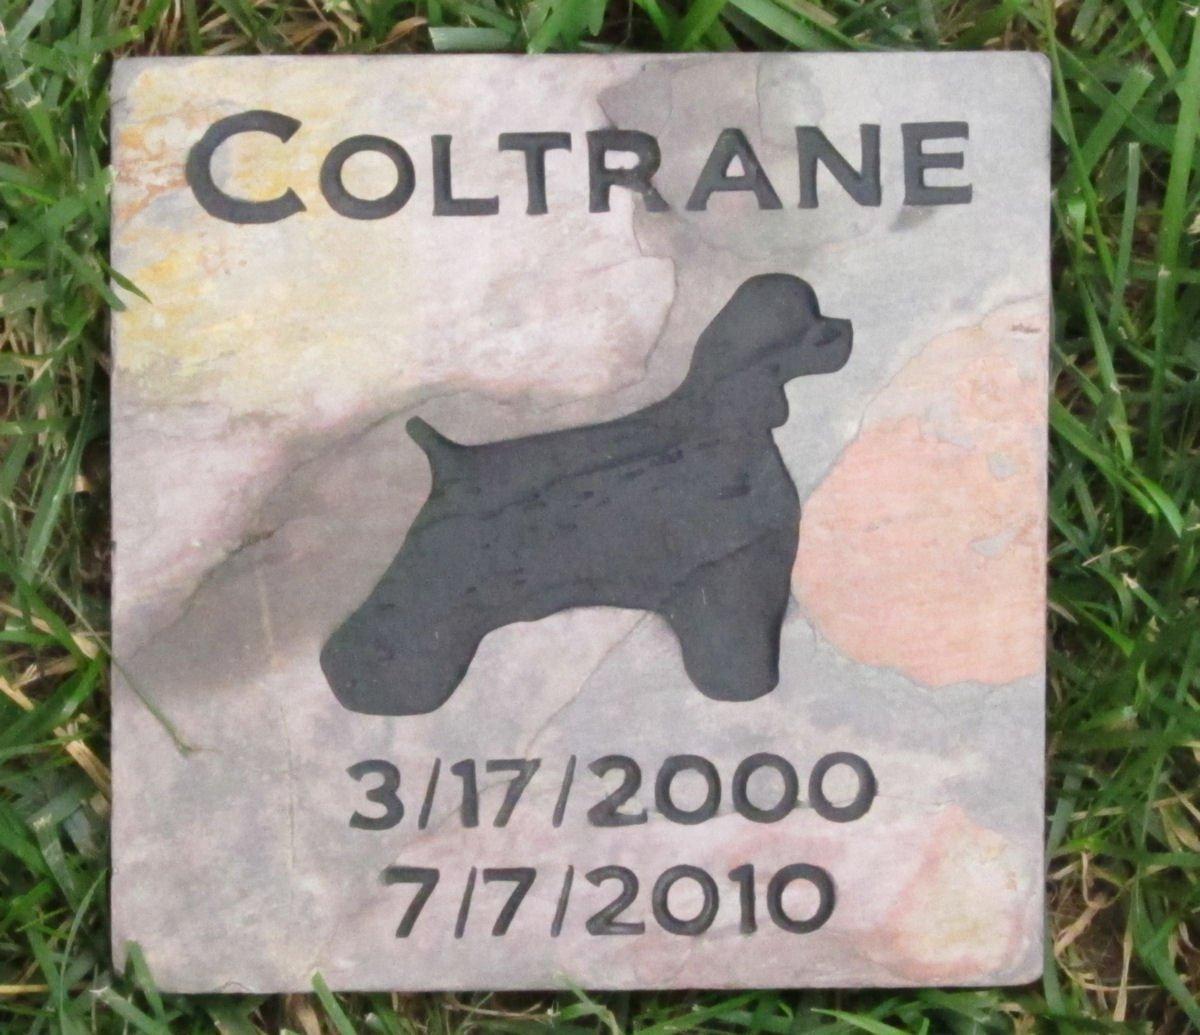 Cocker Spaniel Pet Memorial Garden Stone Grave Maker, Memorial Gift Slate 6 x 6, Other Dog Breeds Available